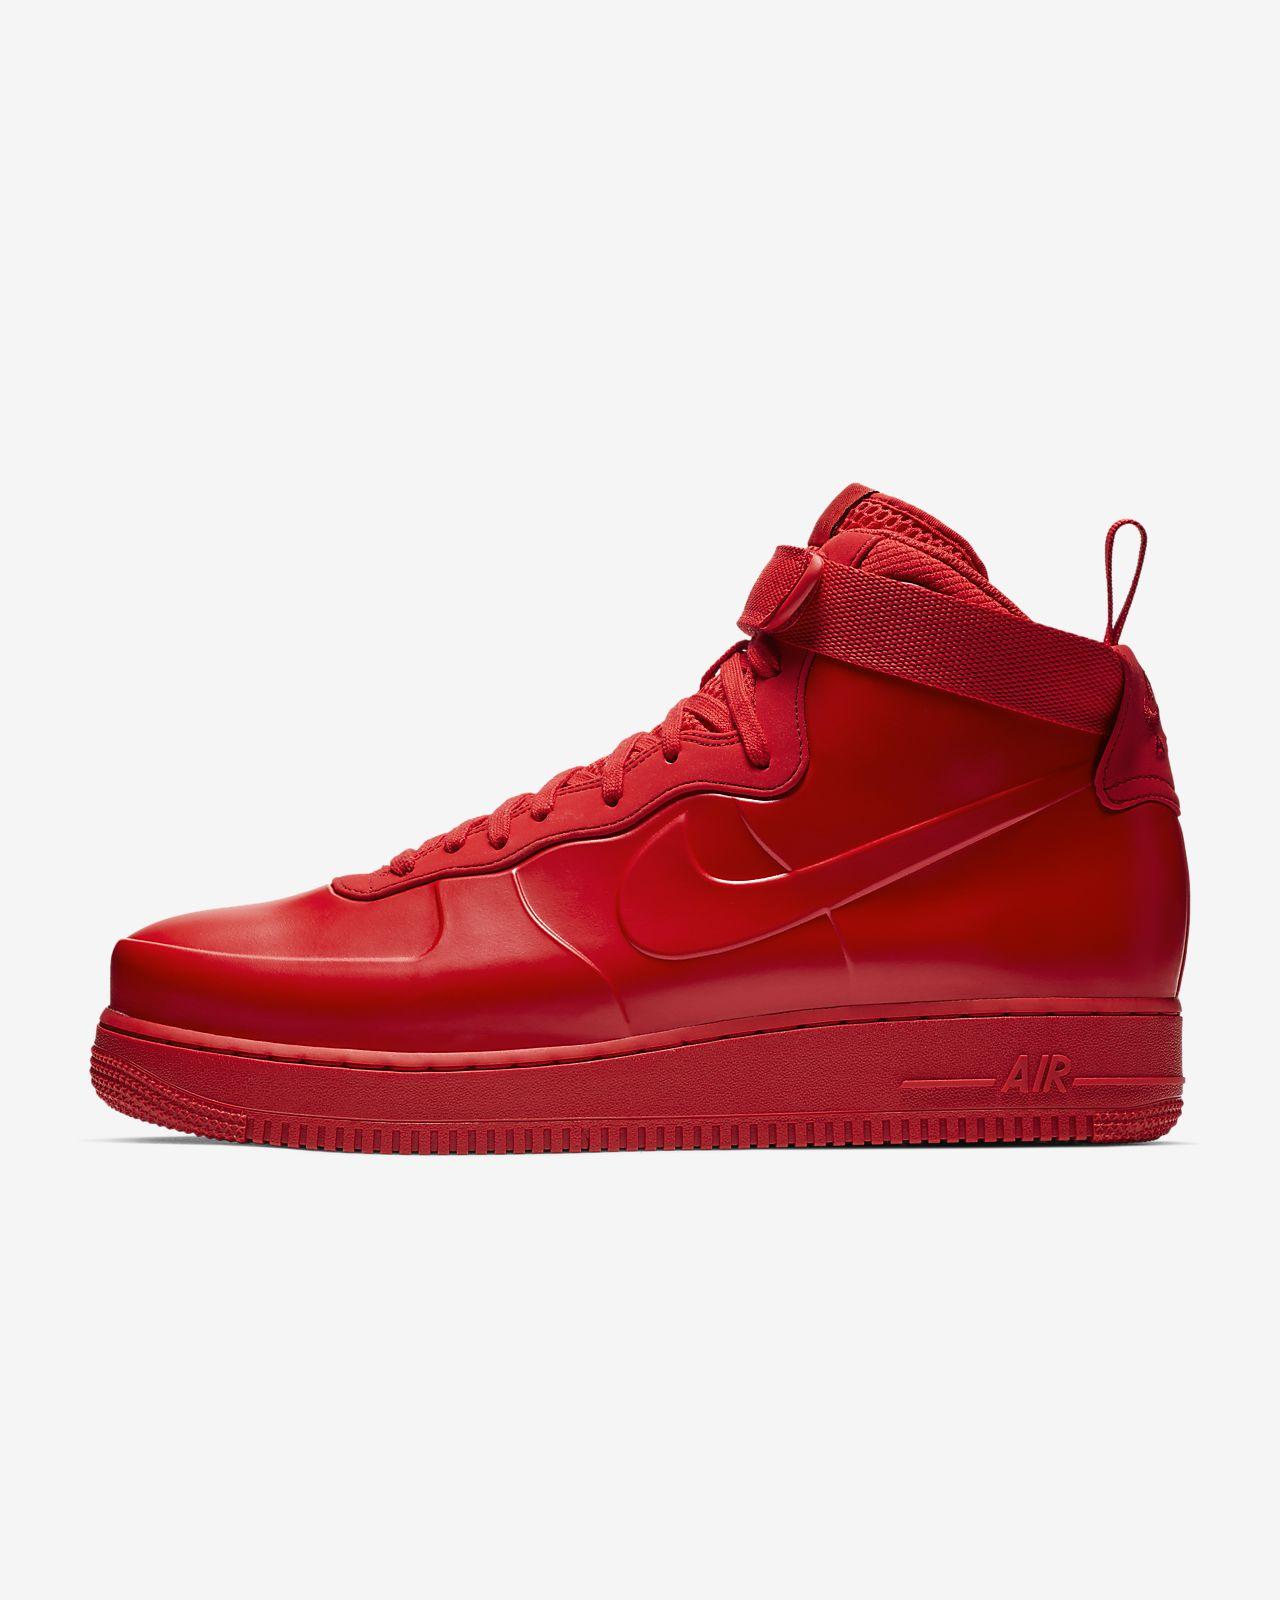 innovative design 52ae1 6c8c9 ... Nike Air Force 1 Foamposite Cupsole Men s Shoe